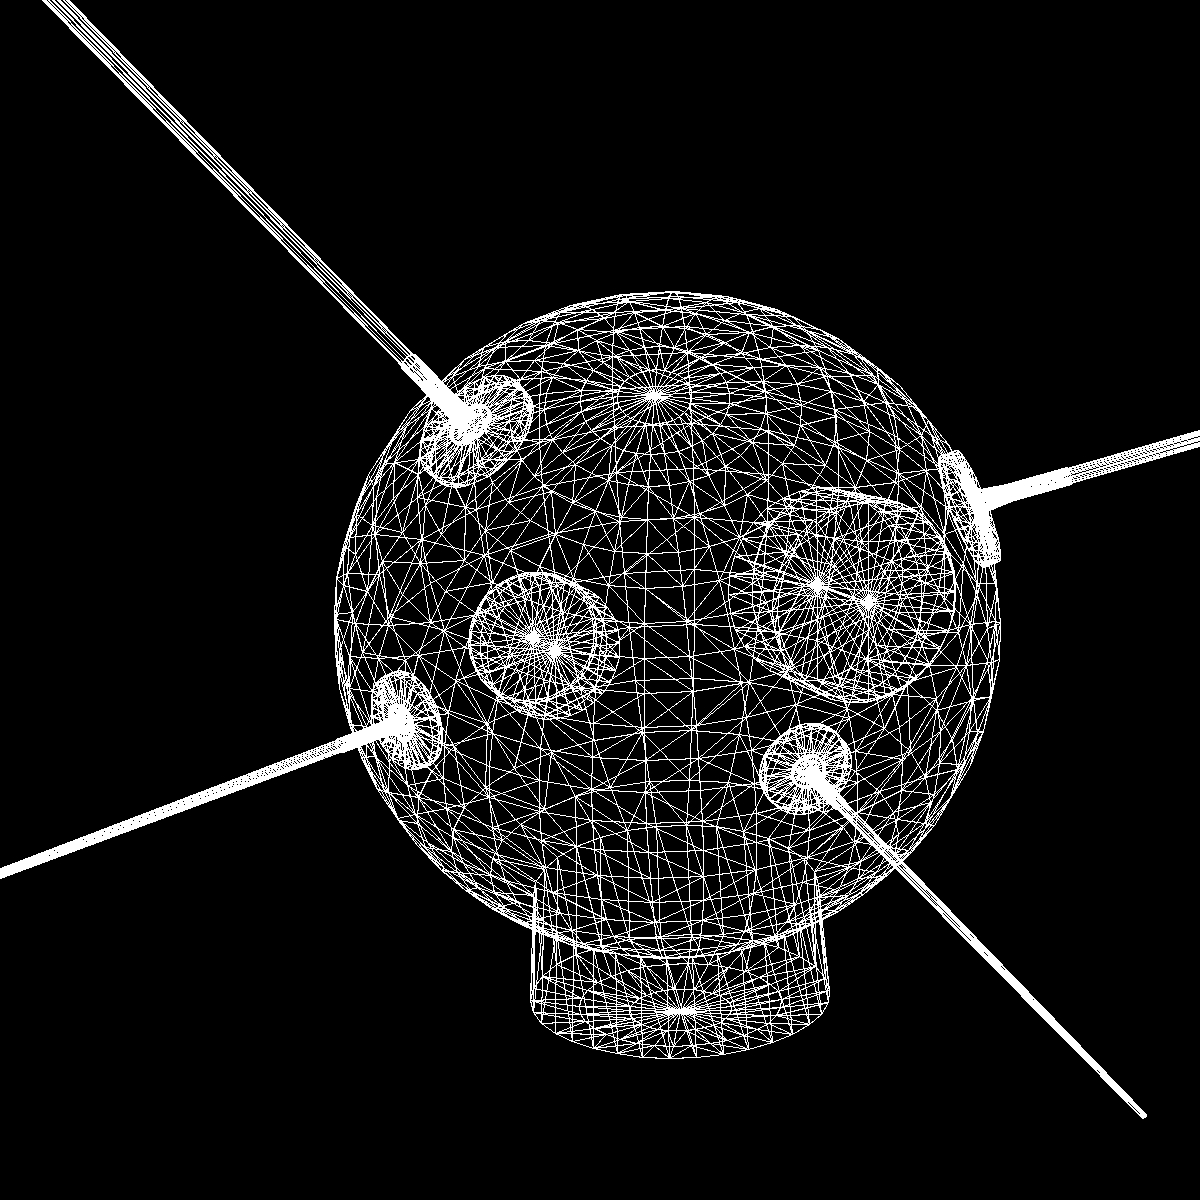 avangard ii satelit 3d model 3ds dxf fbx mješavina cob dae x obj 163949